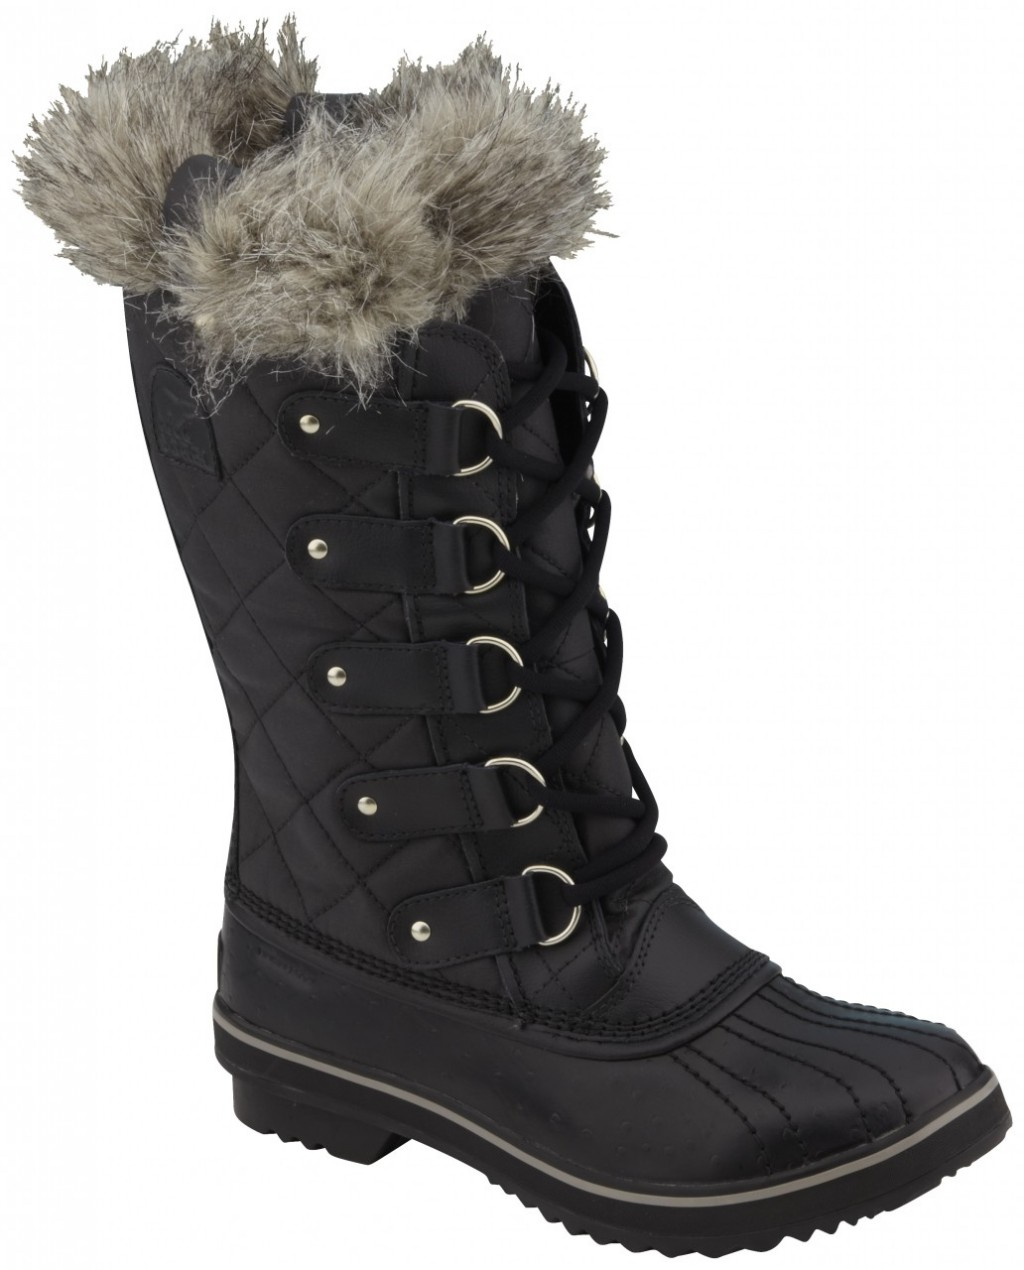 Shoes , Lovely Sorel Boots For Women Product Picture : Unique  Black Sorel Snow Boots Womens